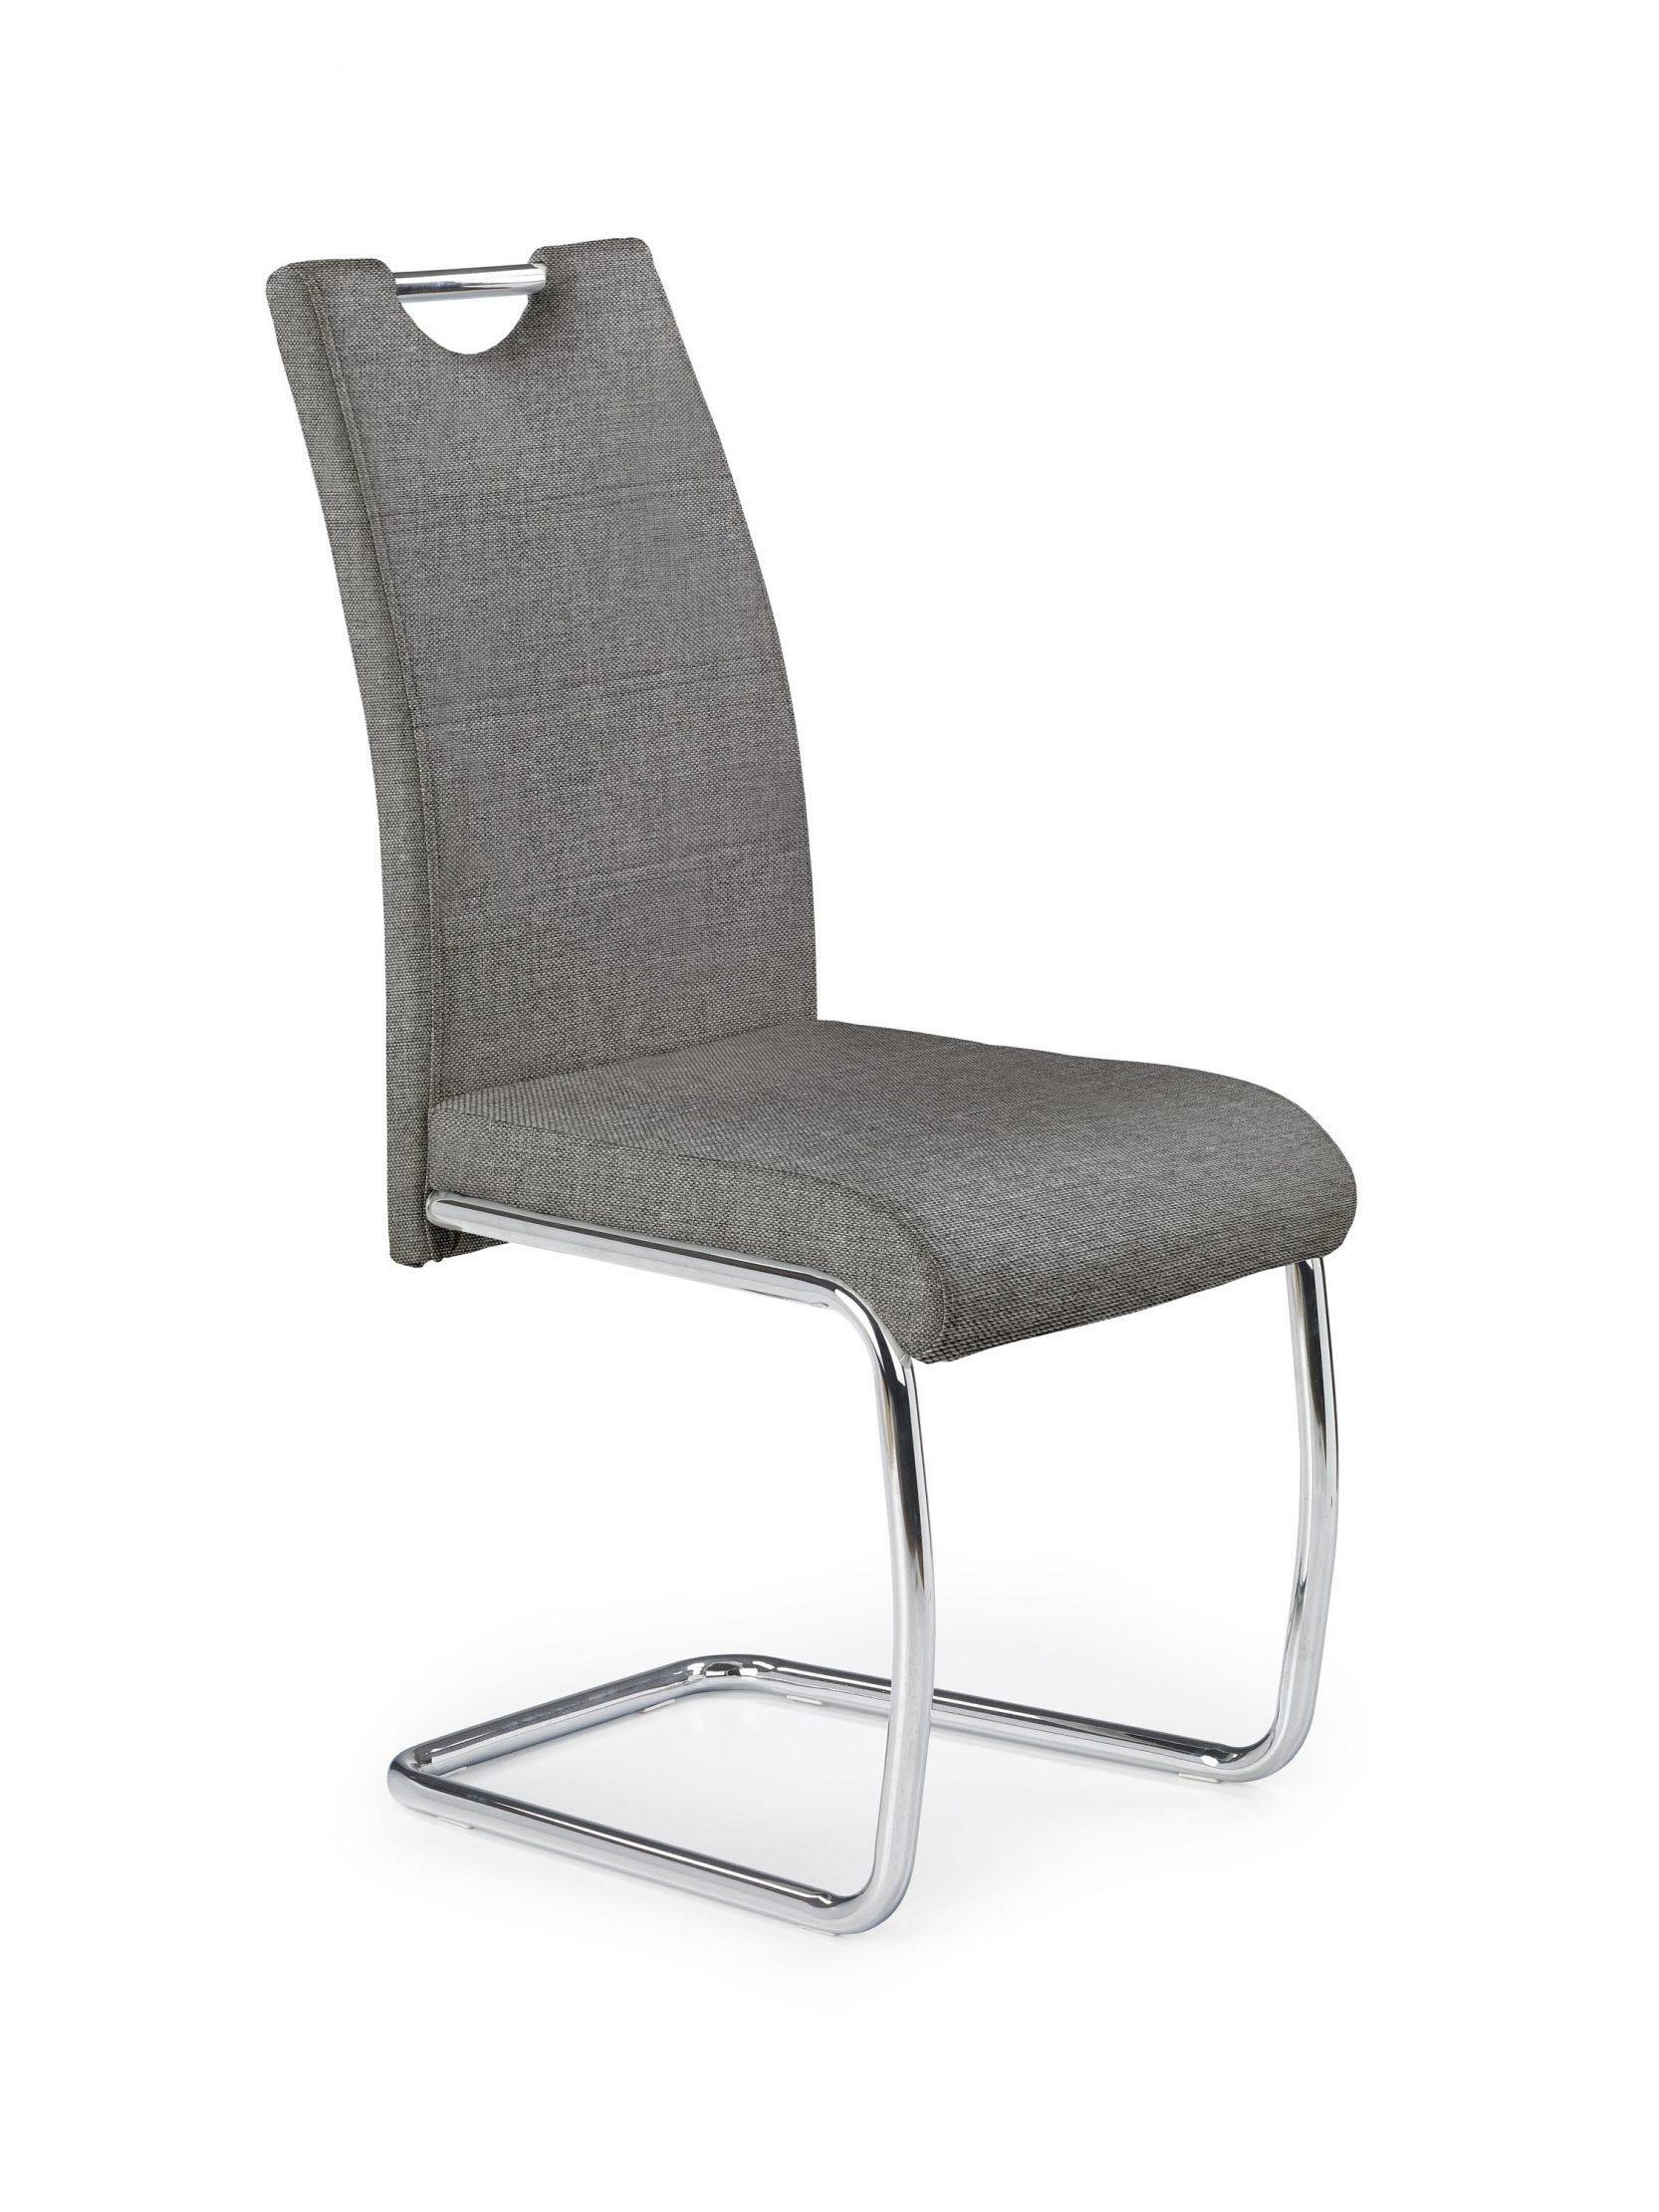 Scaun tapitat cu stofa, cu picioare metalice K349 Gri / Crom, l42xA60xH97 cm